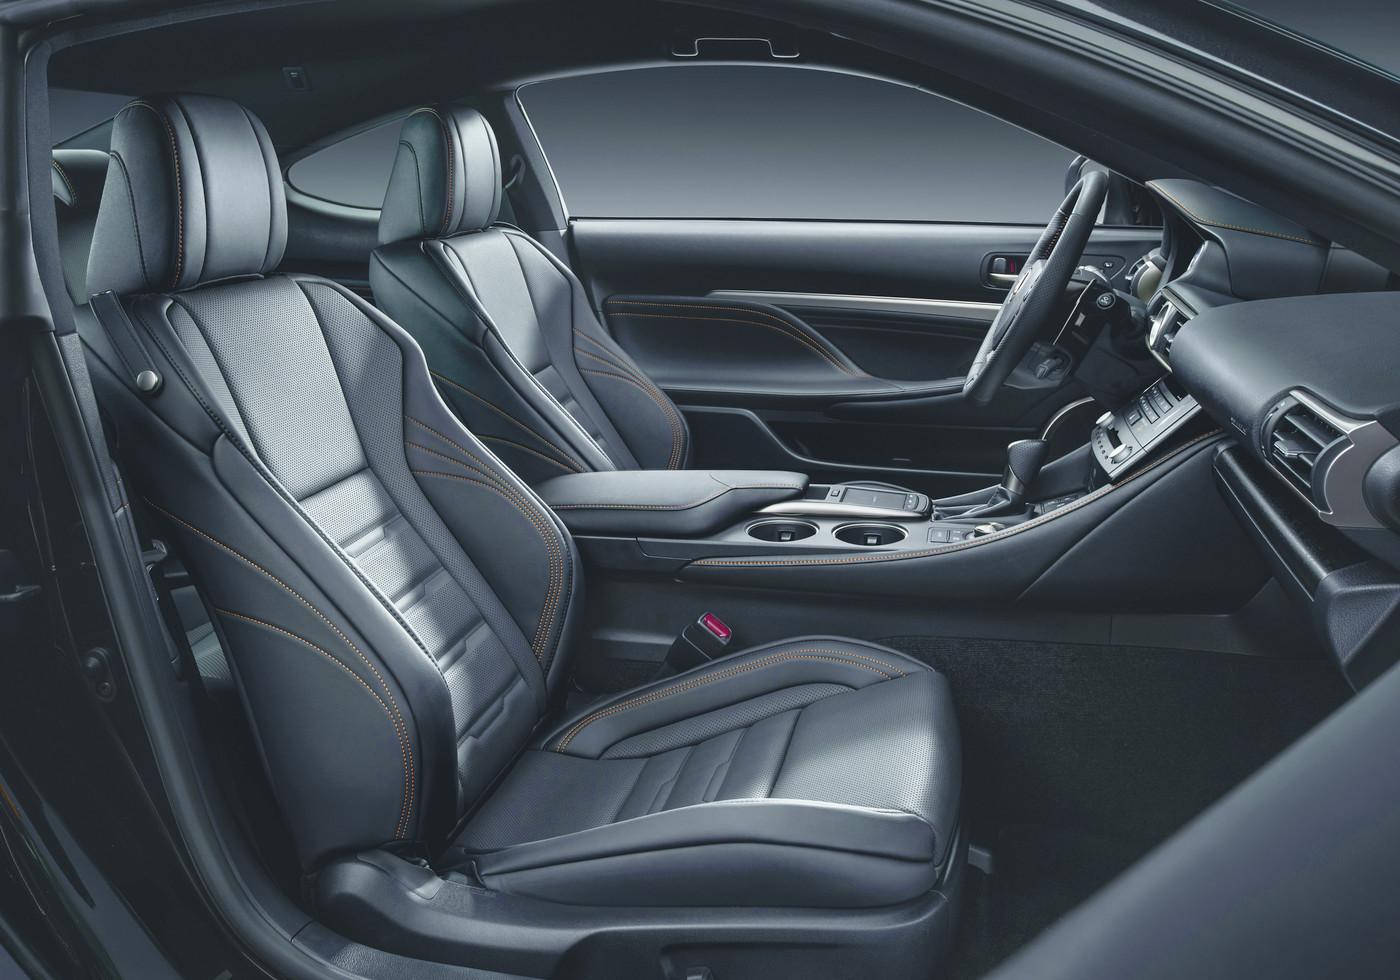 RC black 006 side seat CMYK